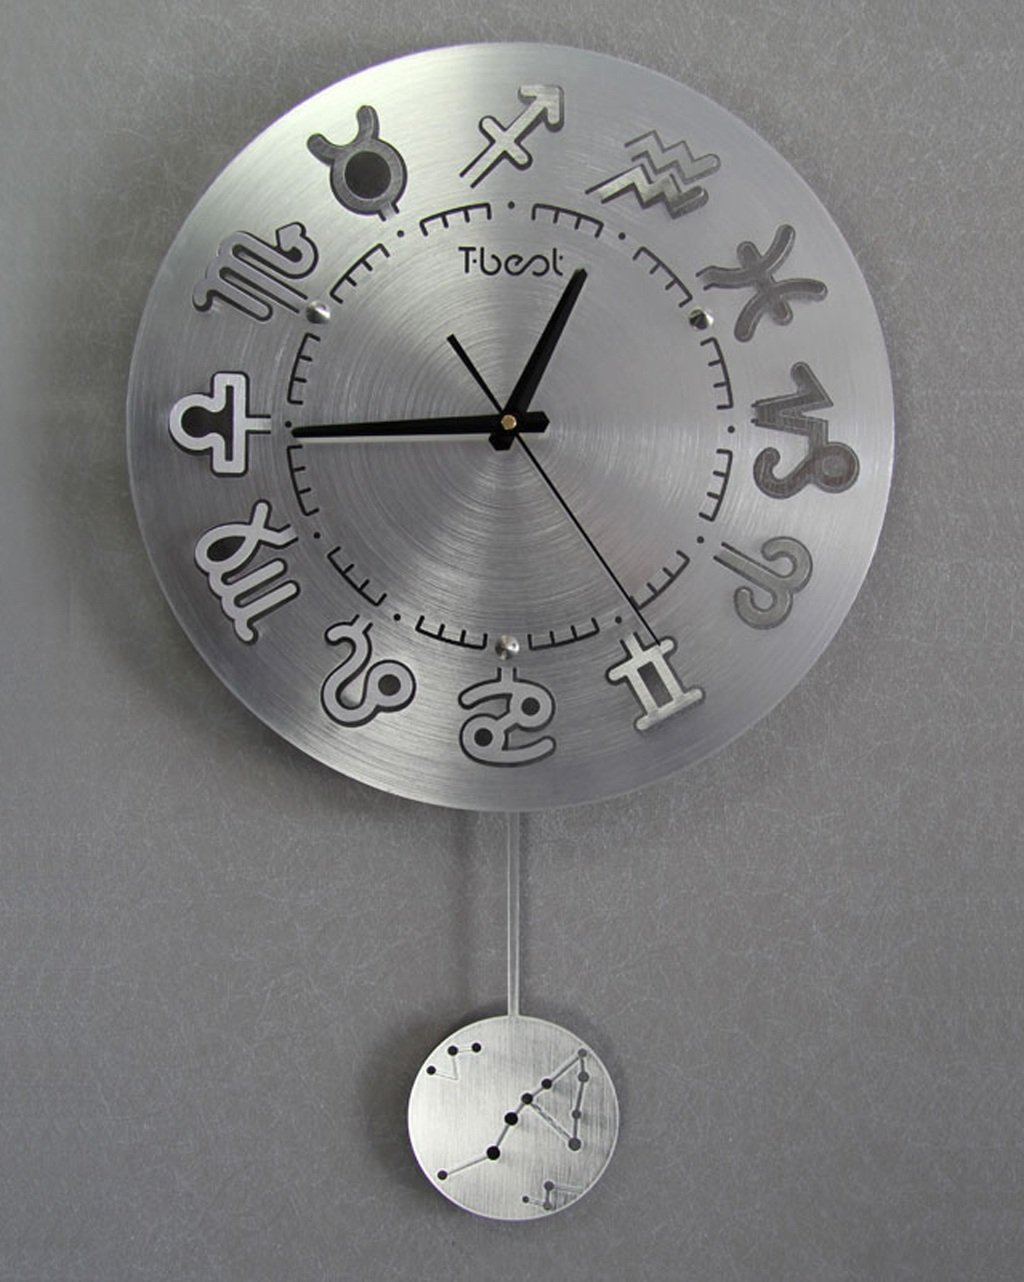 ZHENAI スタイリッシュなリビングルームミュートアート壁掛け時計、ヨーロッパスタイルのパーソナライズされた時計現代壁時計 ( 色 : A , サイズ さいず : 16 Inches ) B07BK2SKGFA 16 Inches